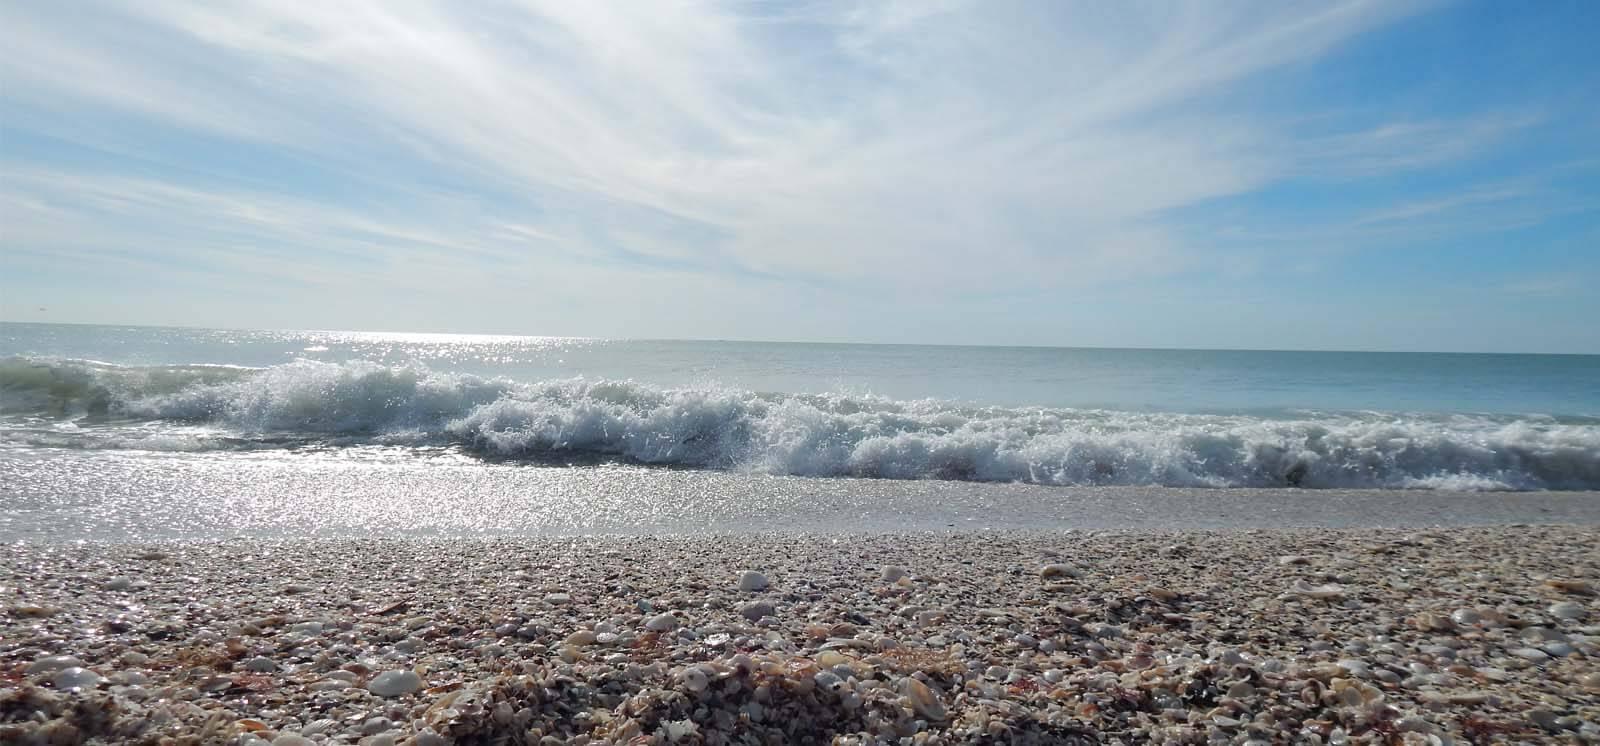 Englewood Beach Resorts |Home - Englewood Beach Resorts